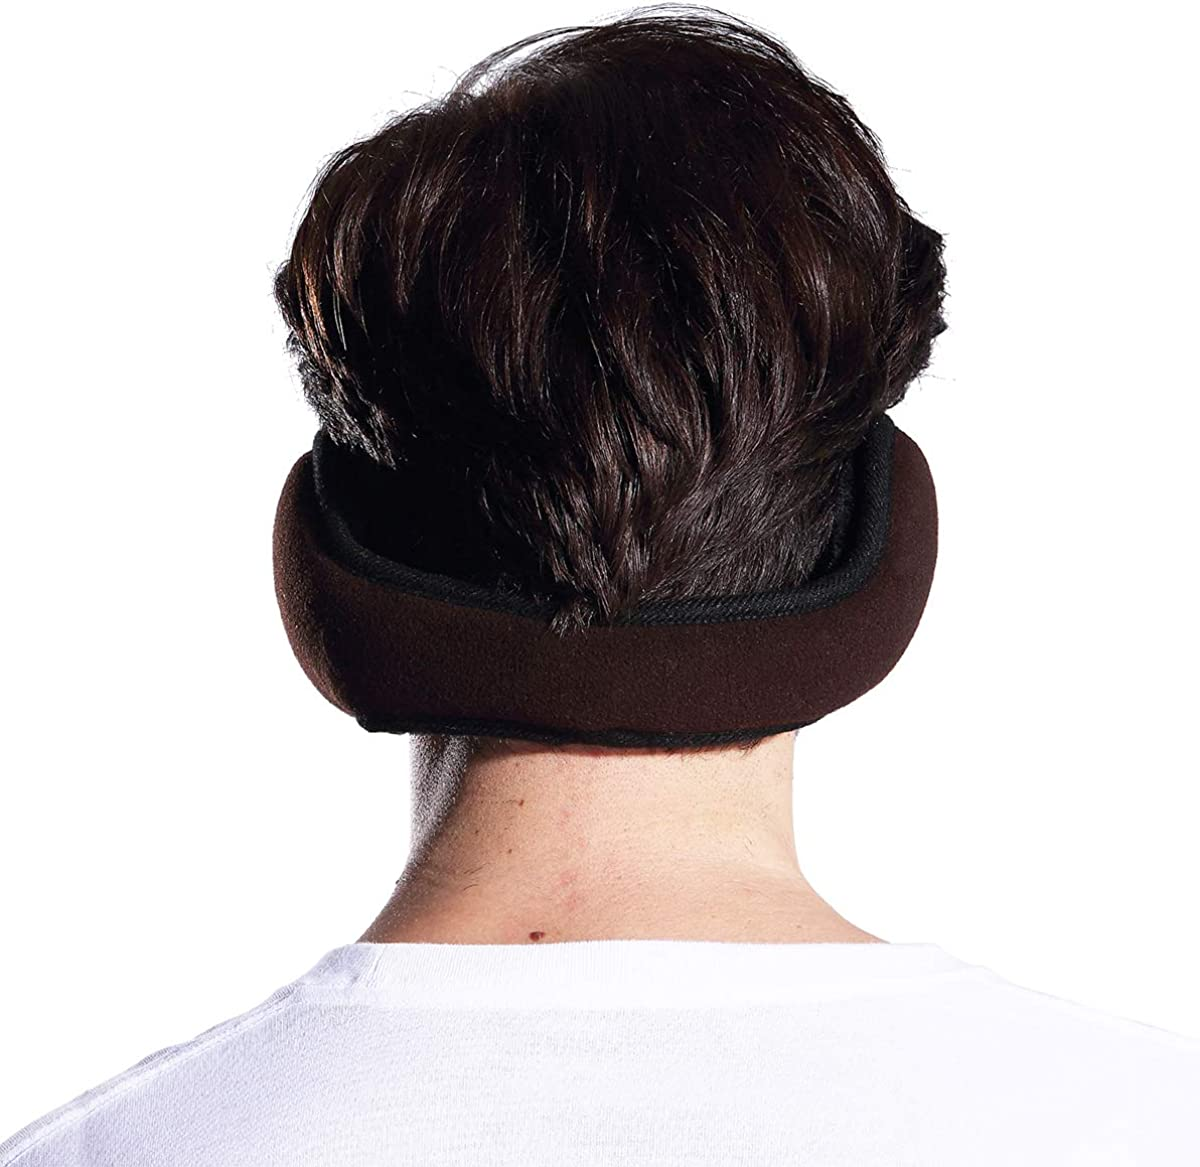 Metog Unisex Foldable Ear Warmers Polar Fleece Winter Earmuffs Coffee at  Women's Clothing store